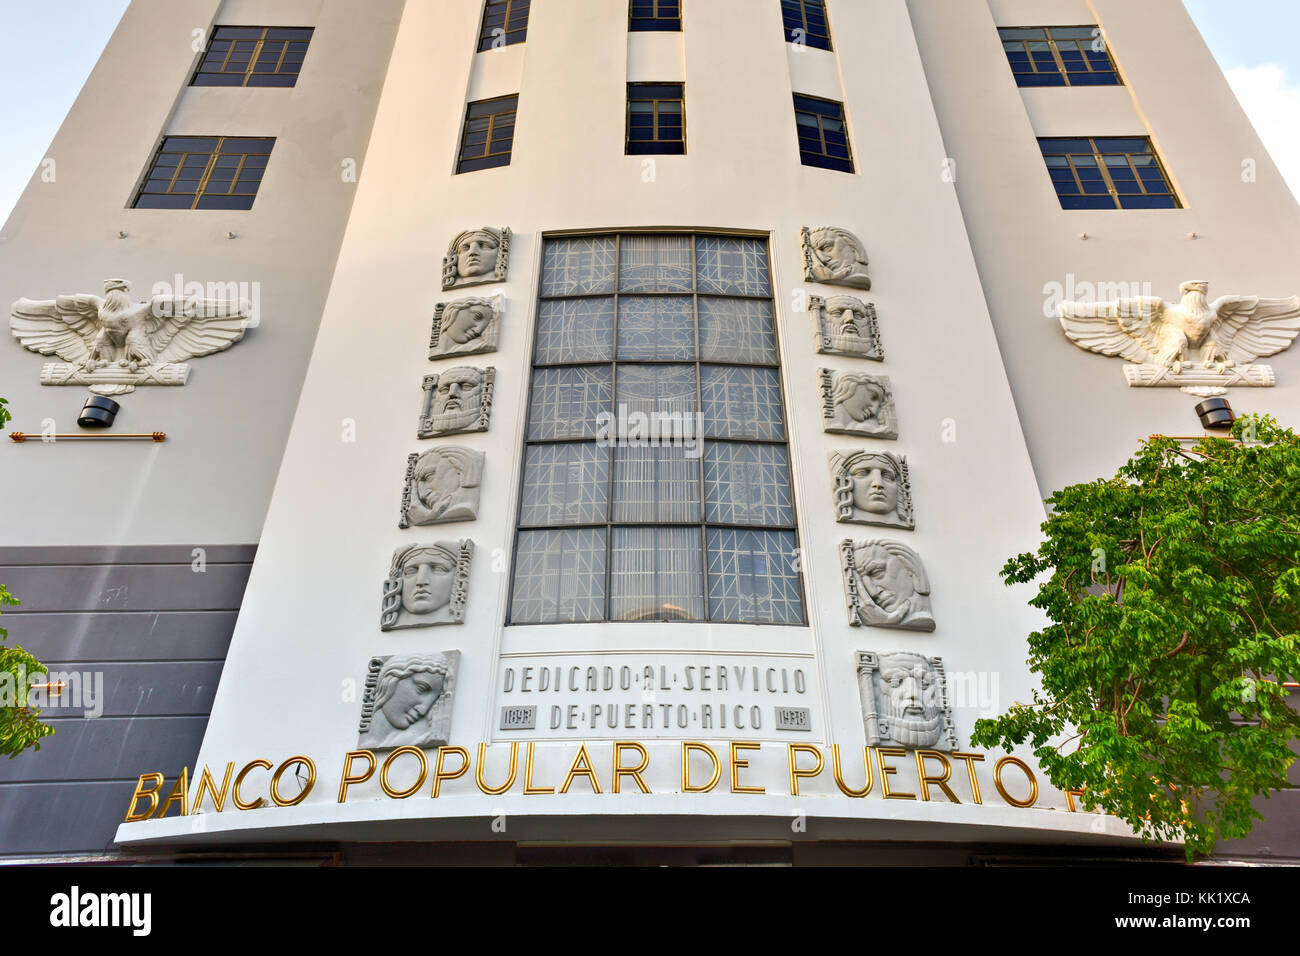 San Juan, Puerto Rico - December 24, 2015: Banco Popular in San Juan, Puerto Rico. The bank in the art deco style - Stock Image